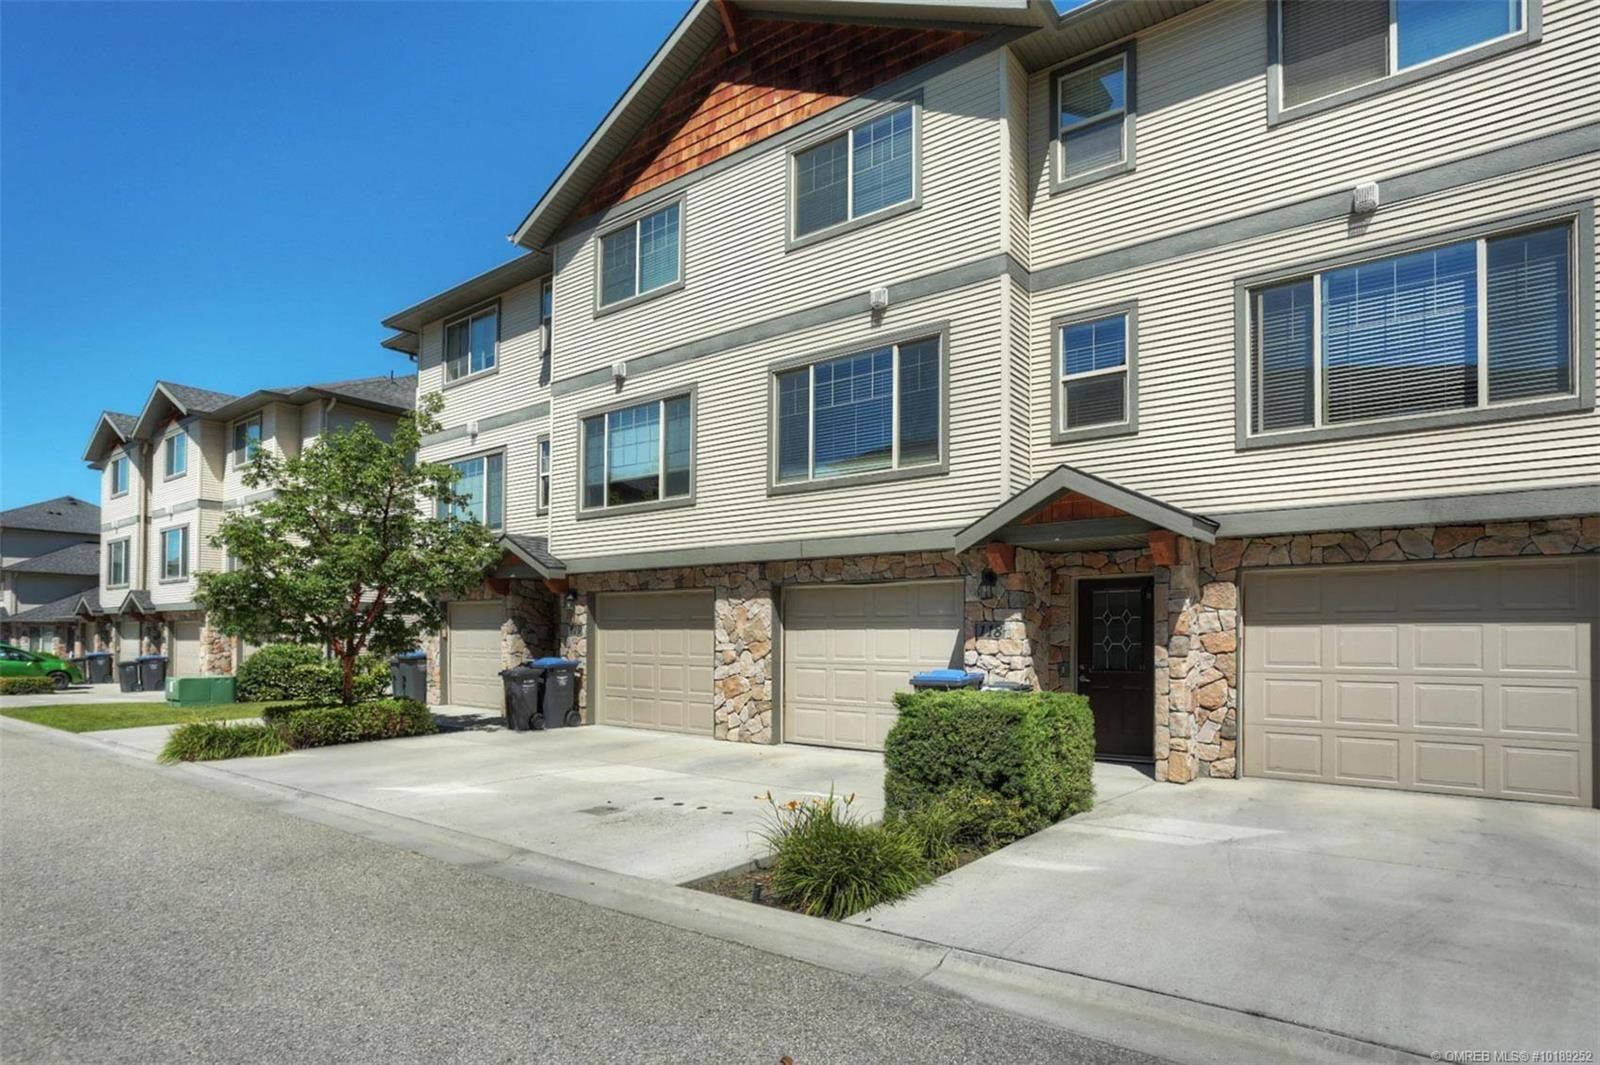 Townhouse for sale at 440 Hartman Rd Unit 118 Kelowna British Columbia - MLS: 10189252